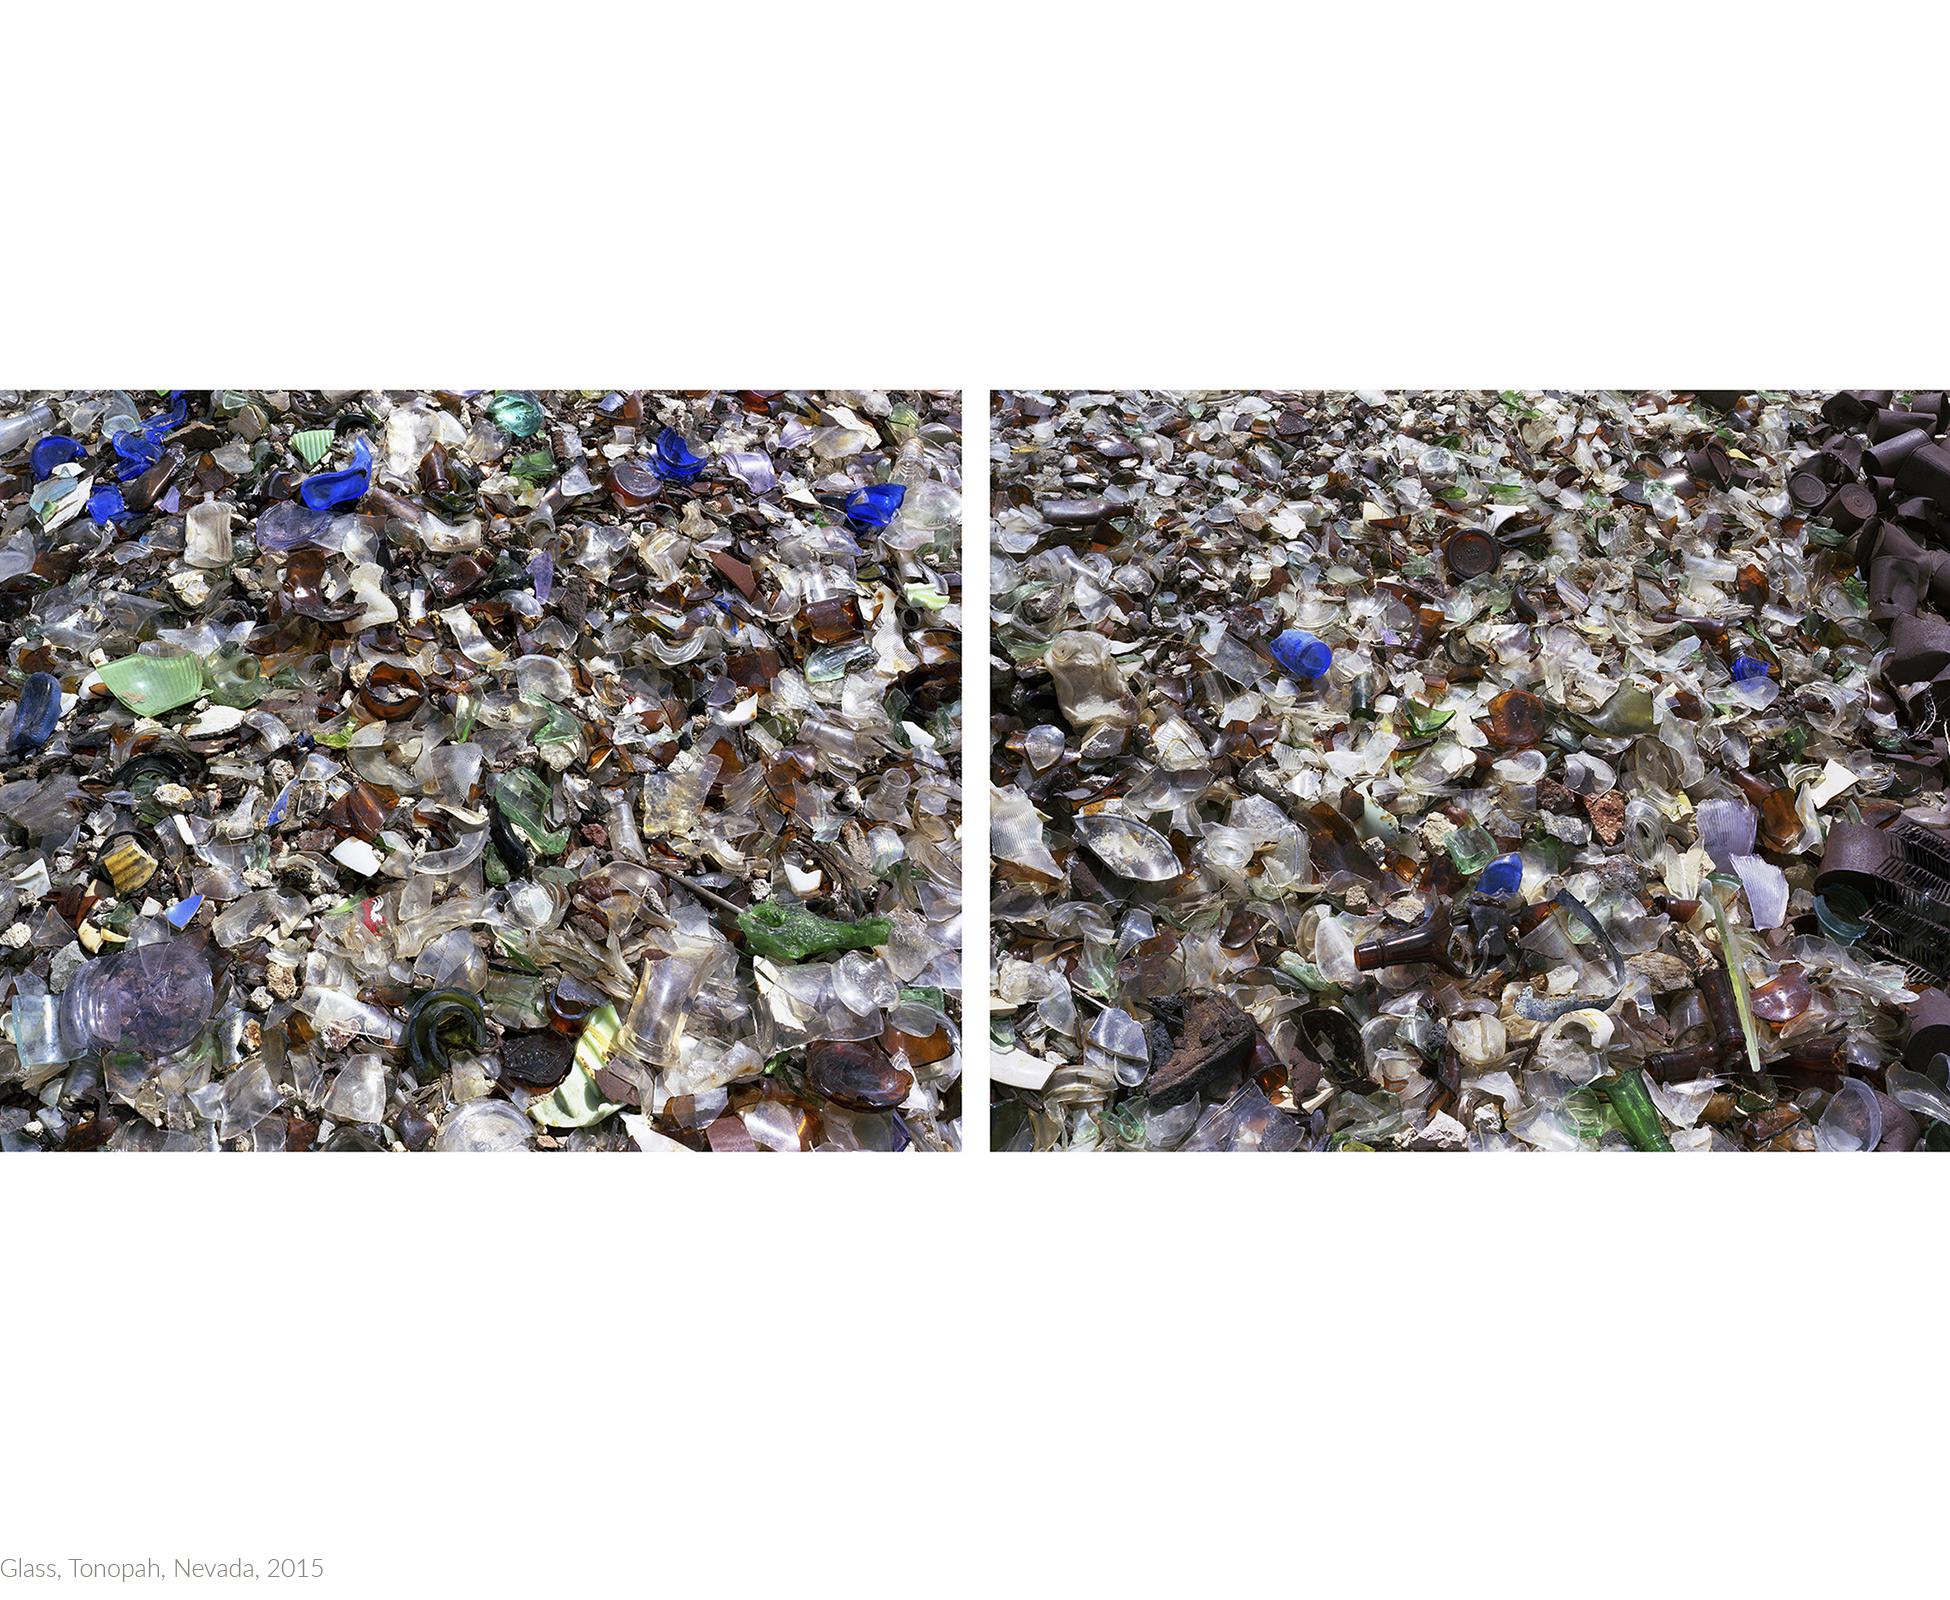 Glass,+Tonopah,+Nevada,+2015+copytitledsamesize.jpg